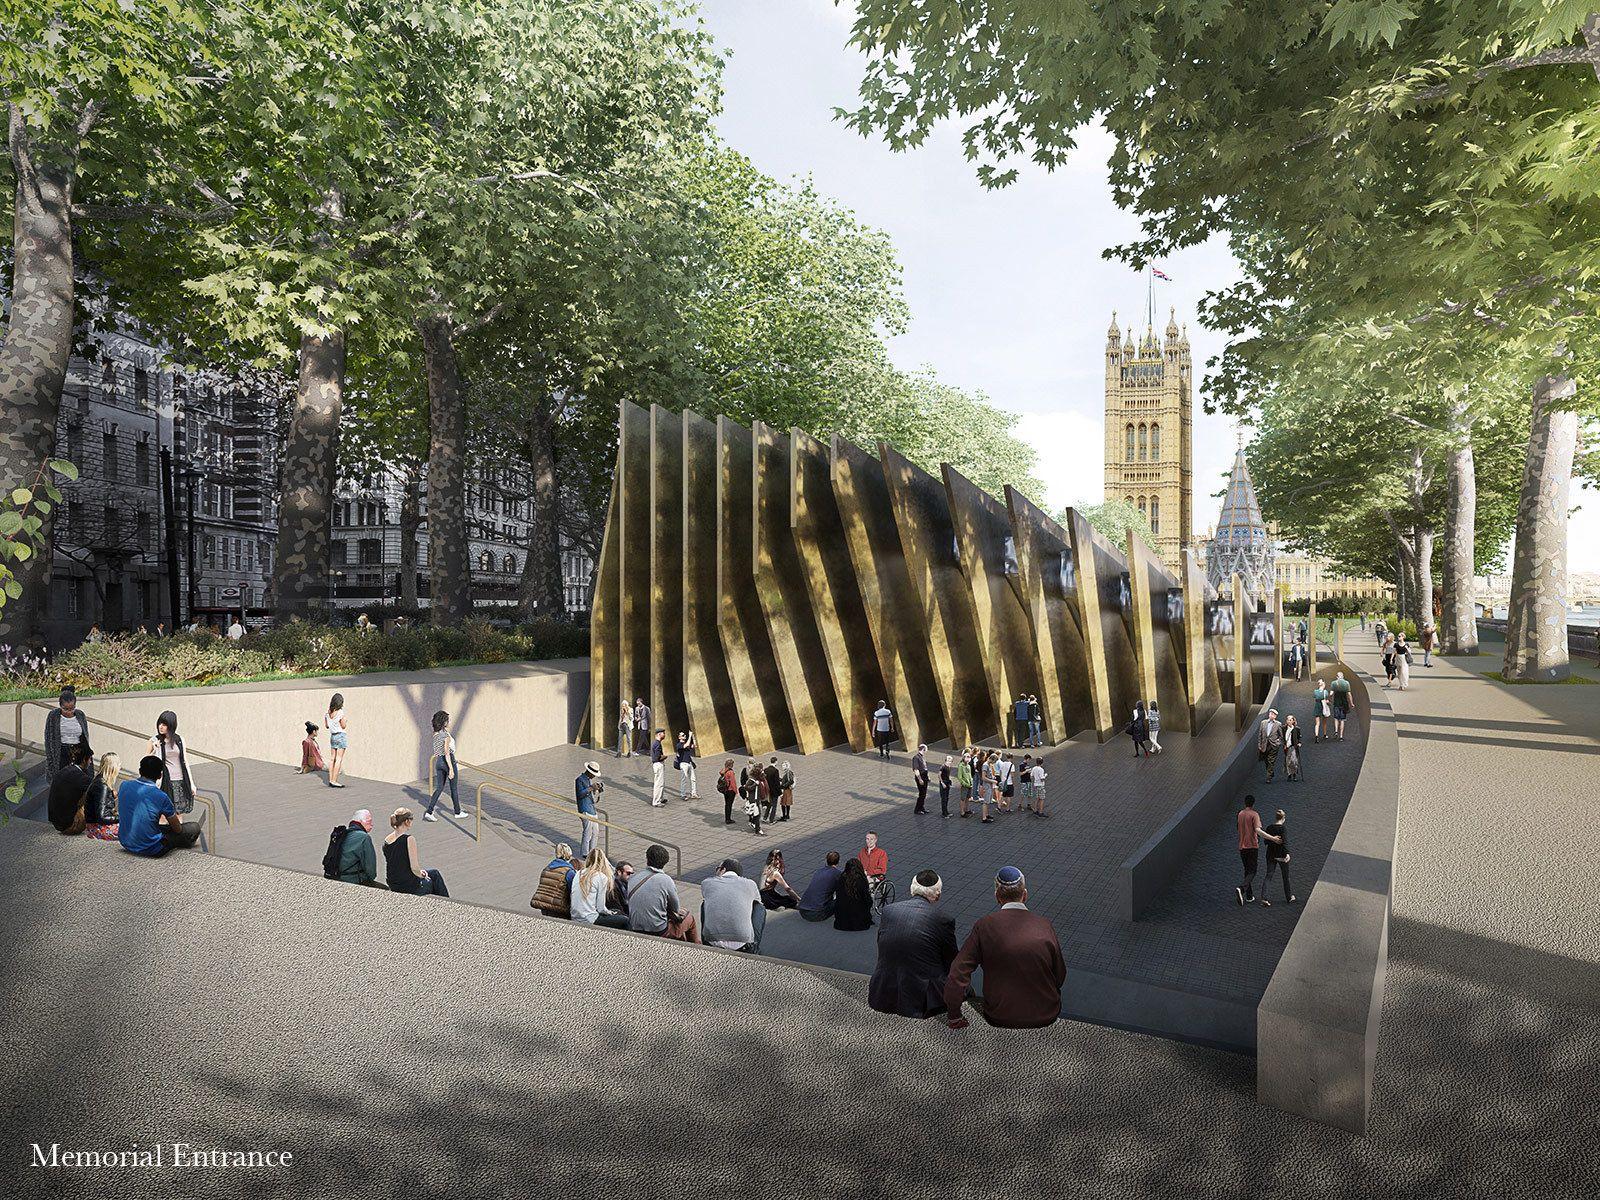 Adjaye Associates and Ron Arad Architects — UK Holocaust Memorial International Design Competition